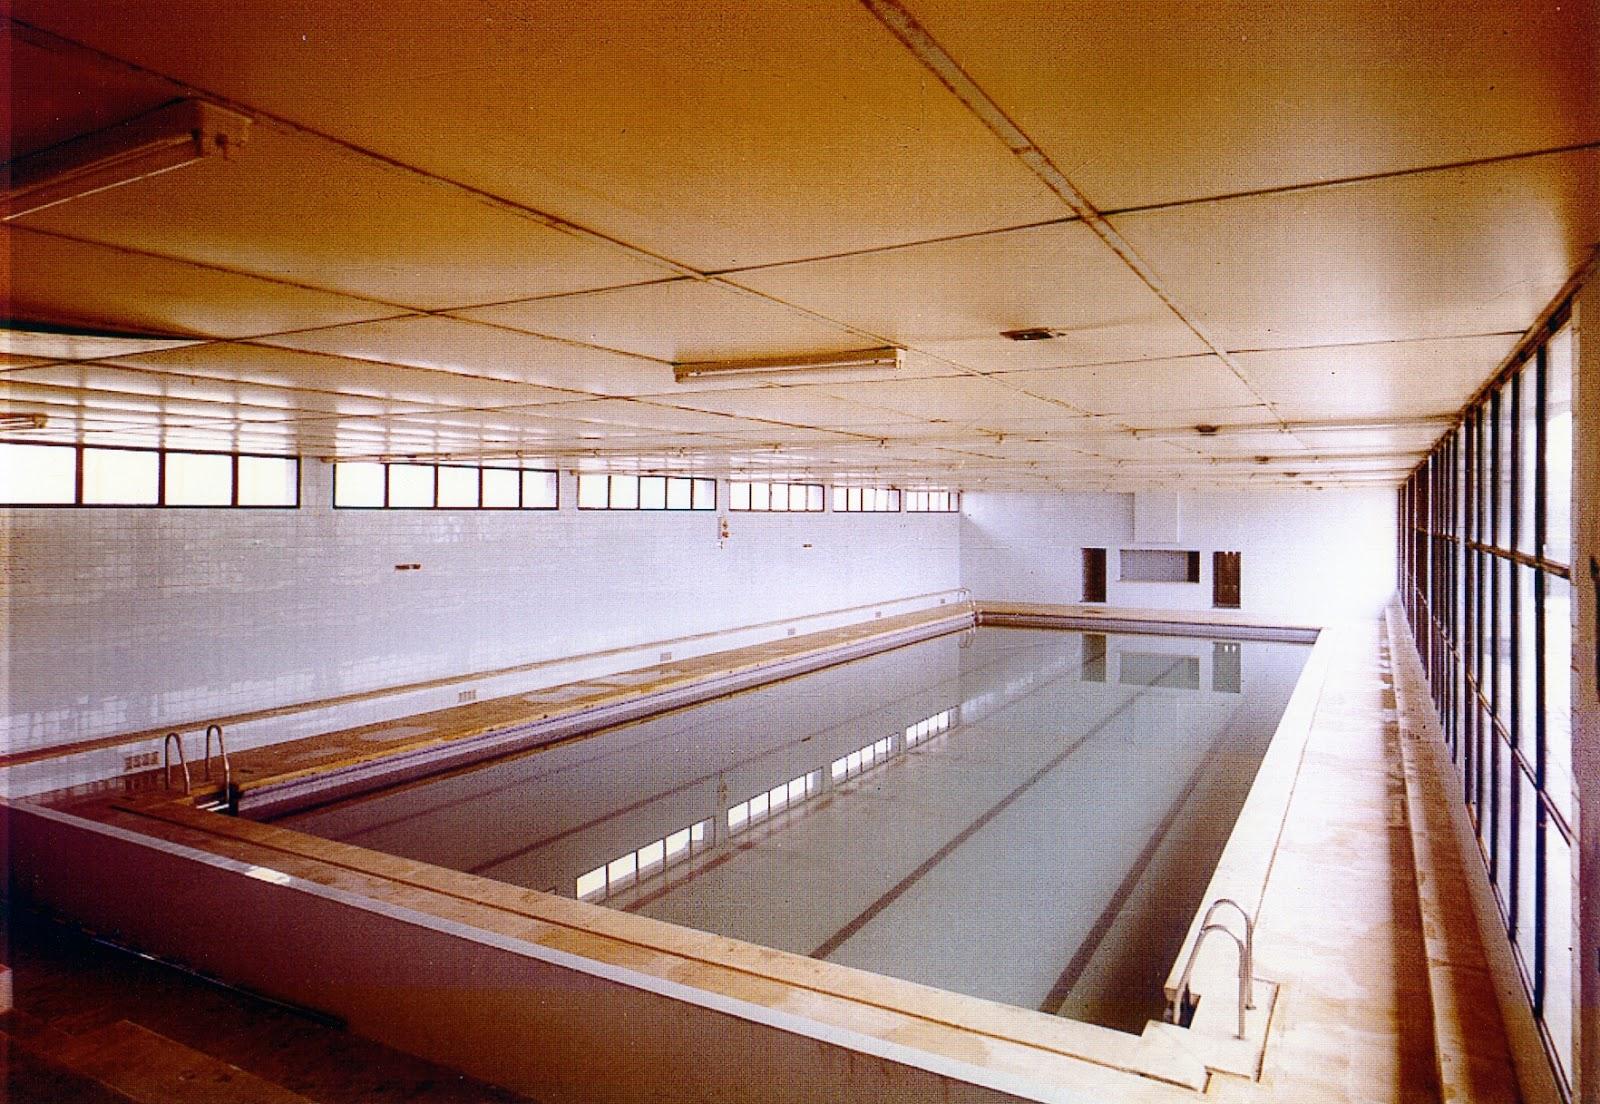 Nec nataci n el cristo antiguas piscinas del cristo for Temperatura piscina climatizada